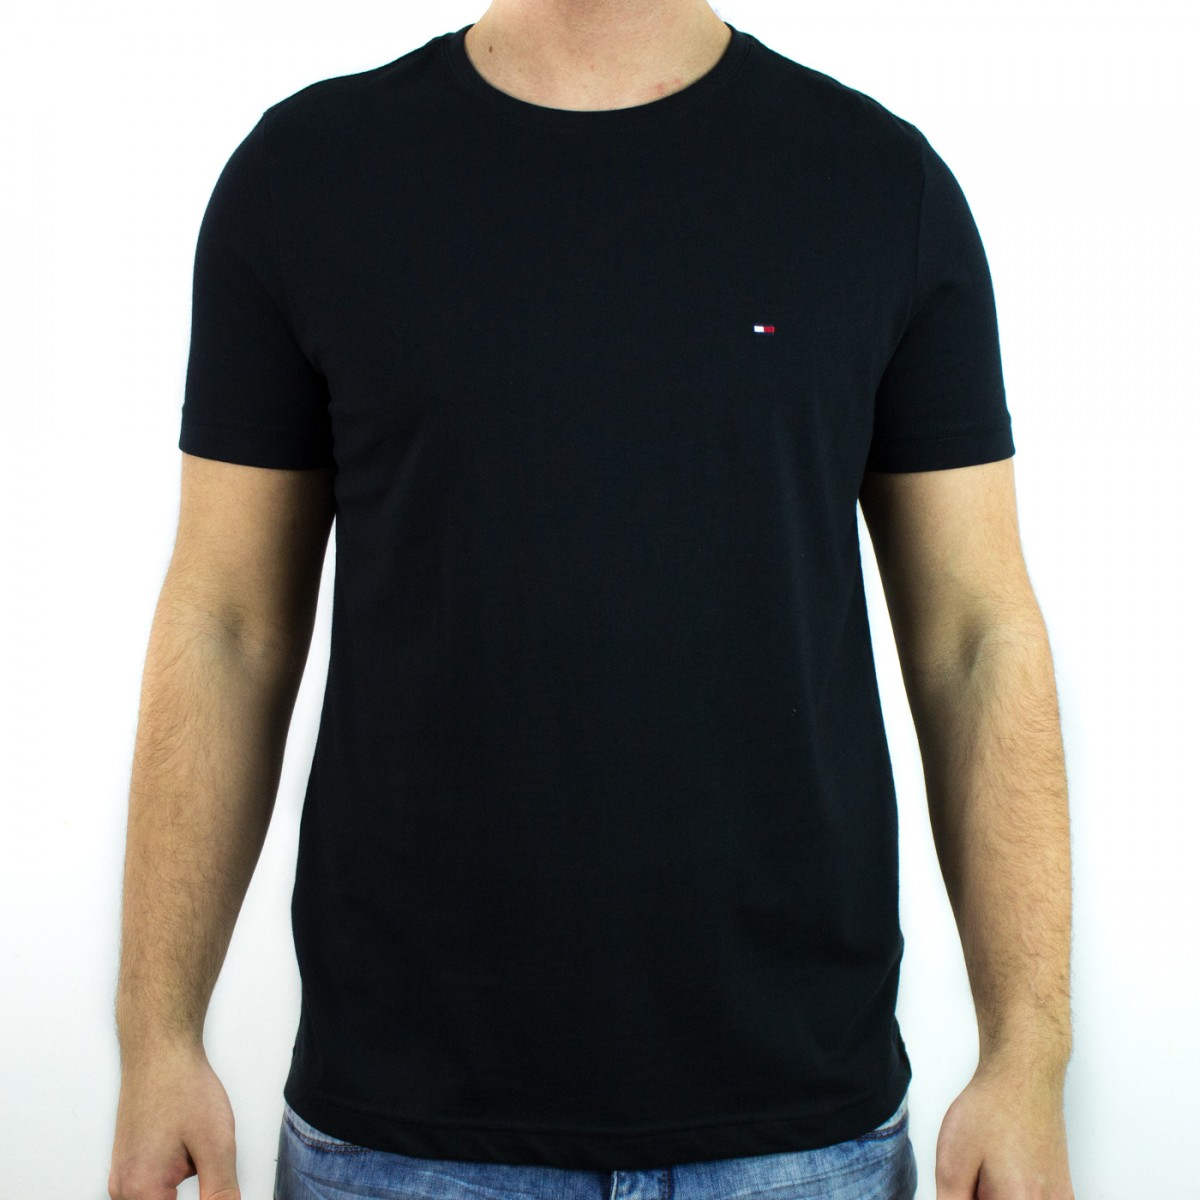 ef64722694 Bizz Store - Camiseta Masculina Tommy Hilfiger Manga Curta